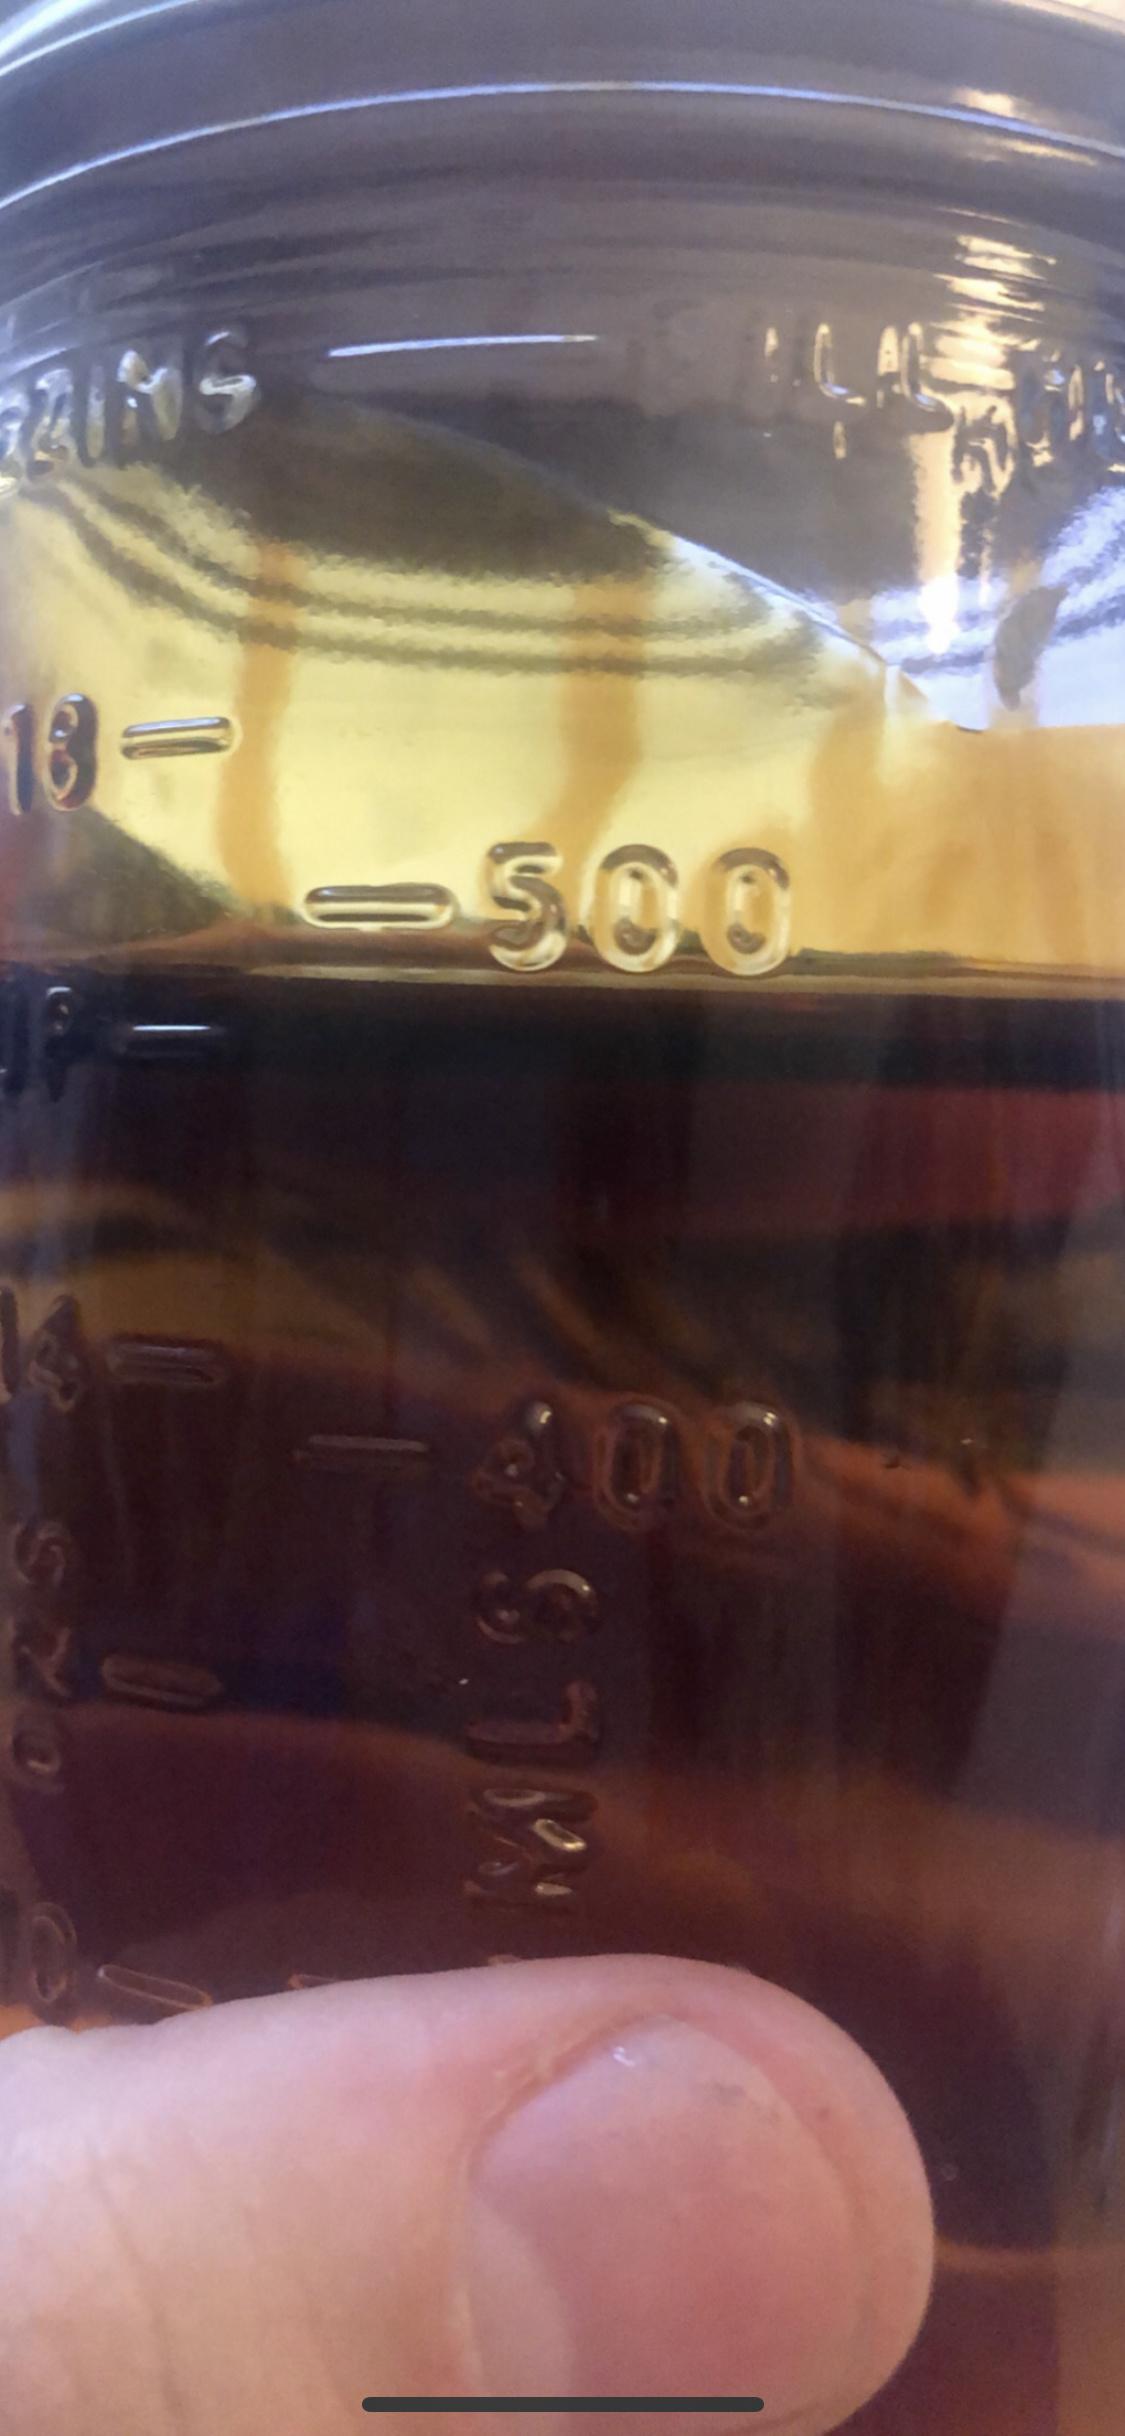 1L of pure distillate in grams - CannaBusiness - Future4200